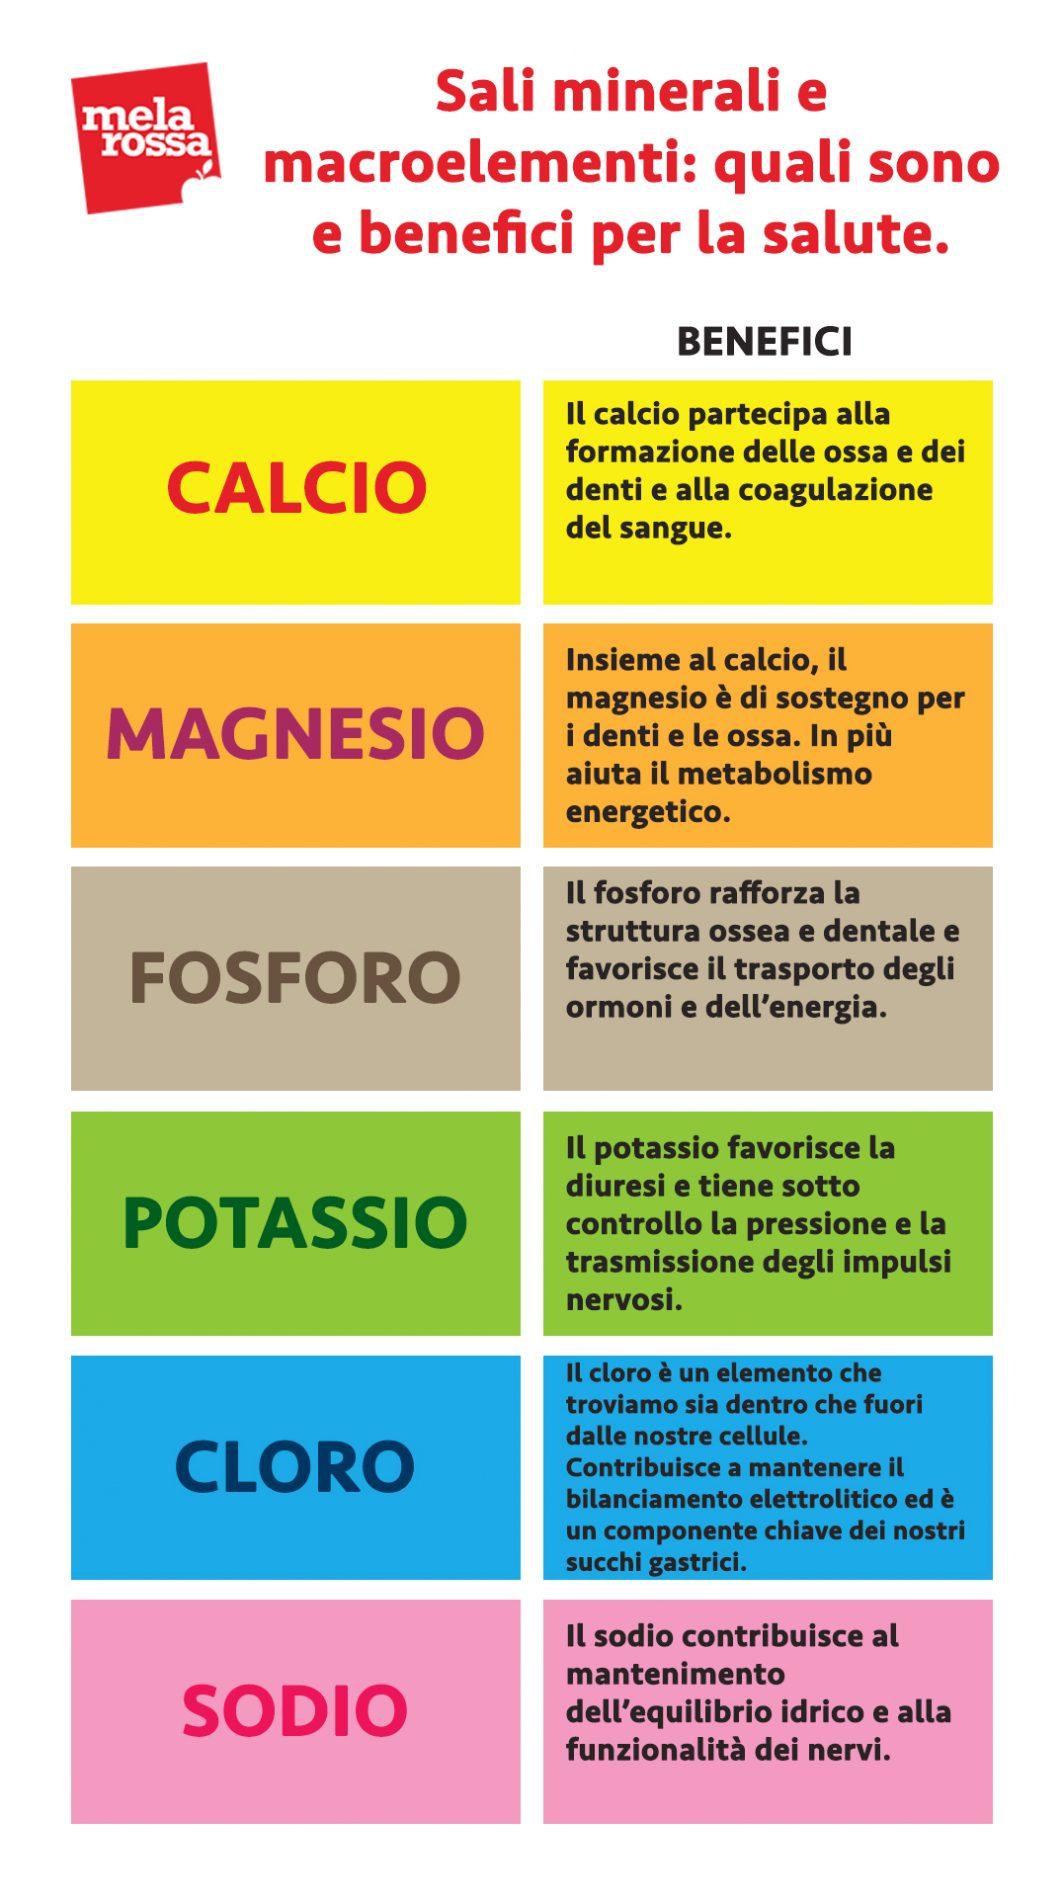 sali minerali: benefici dei macroelementi